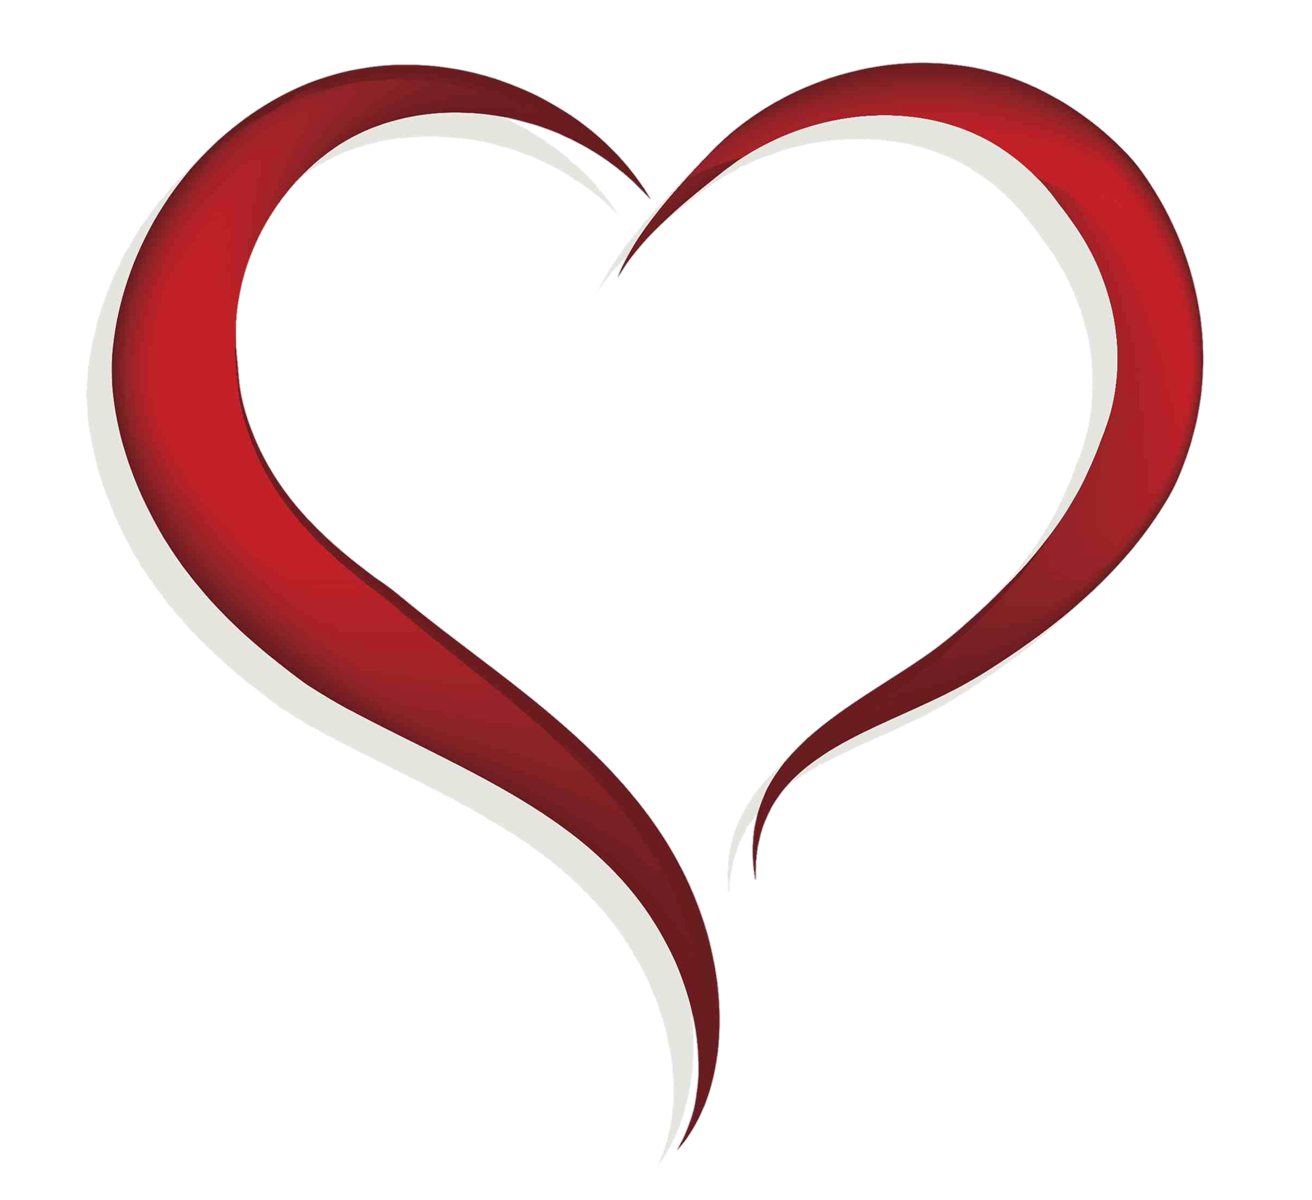 Life clipart heart. Fotolip com rich image